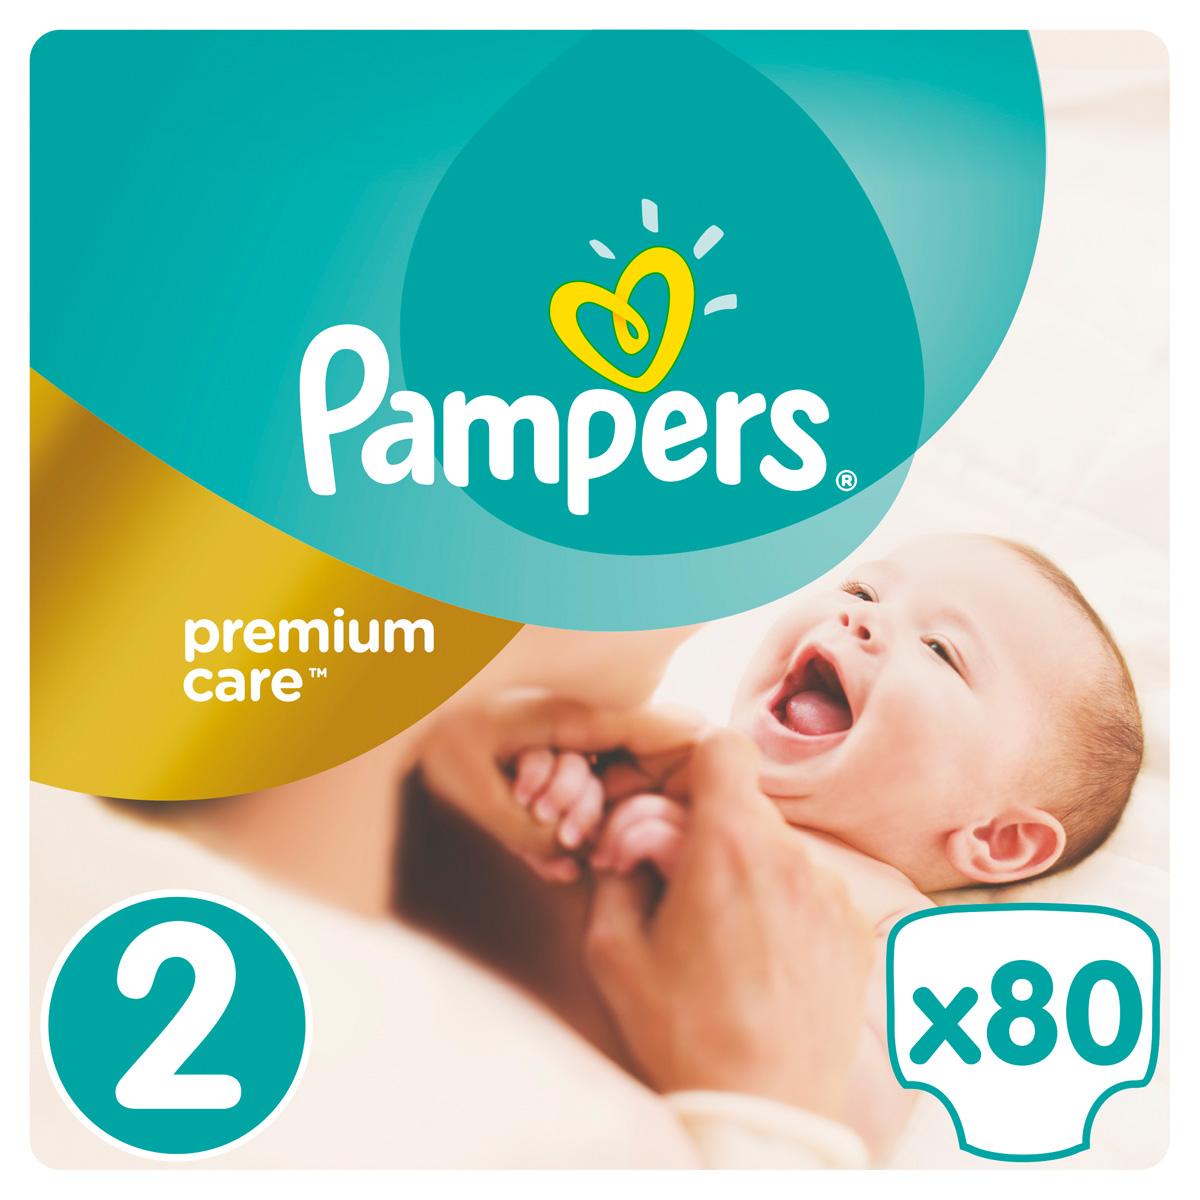 Pampers Подгузники Premium Care 3-6 кг (размер 2) 80 шт greenty подгузники greenty 5 13 кг 32 шт